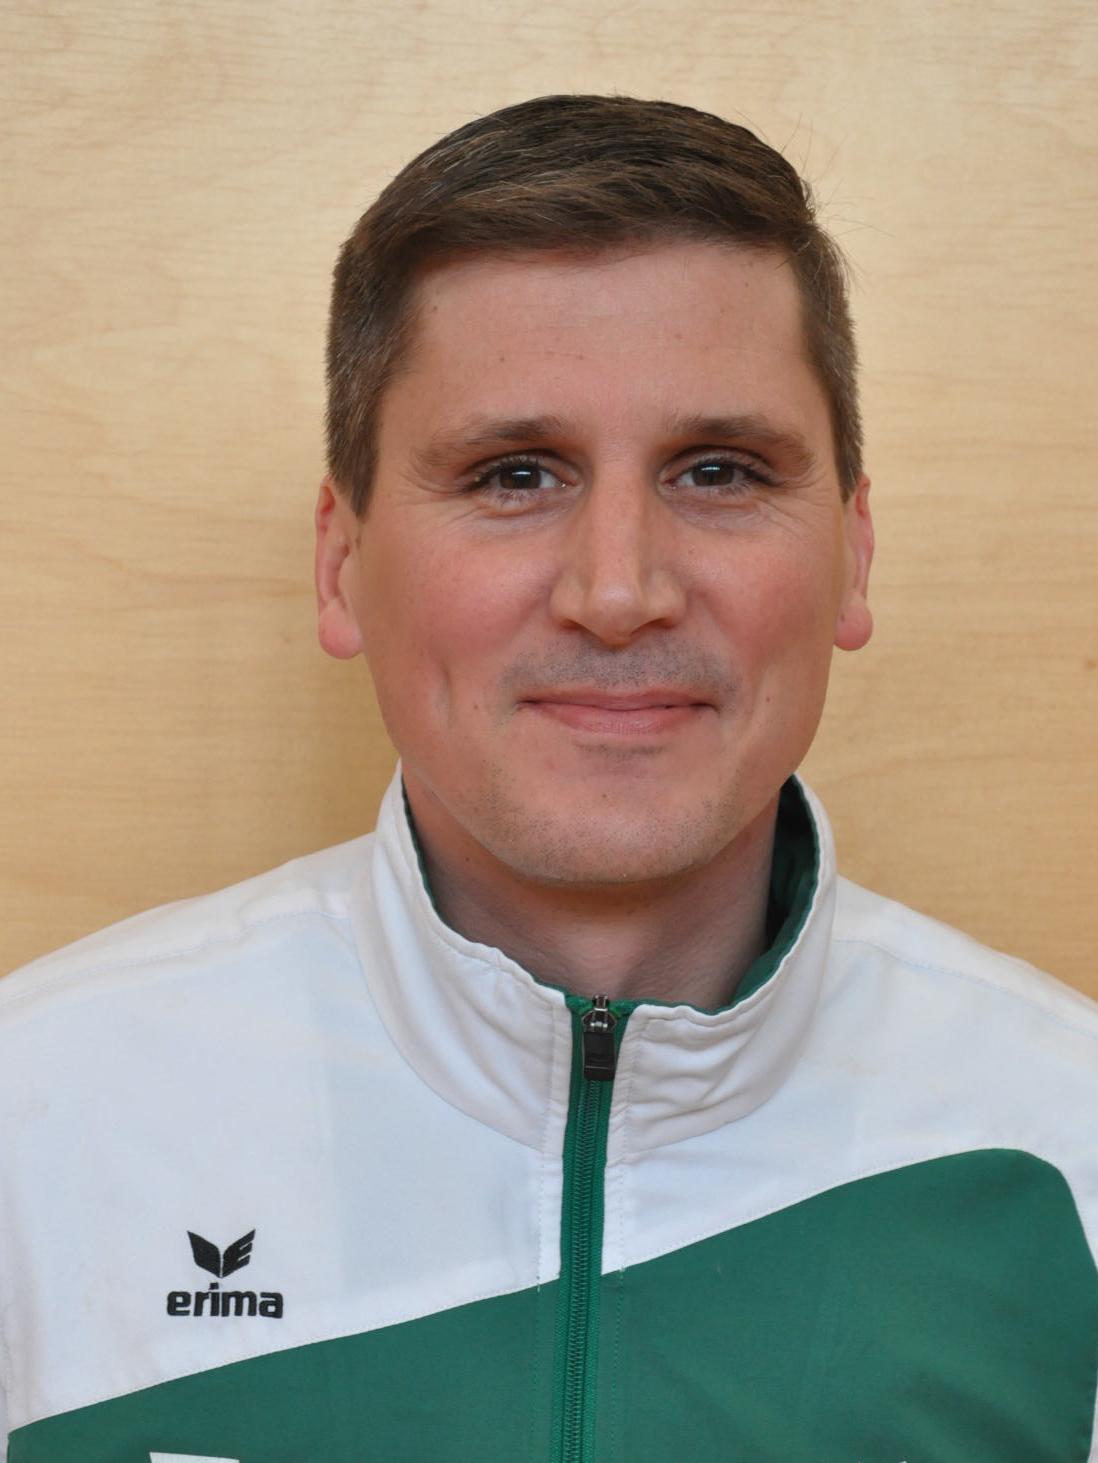 Gerd Müller - Trainer